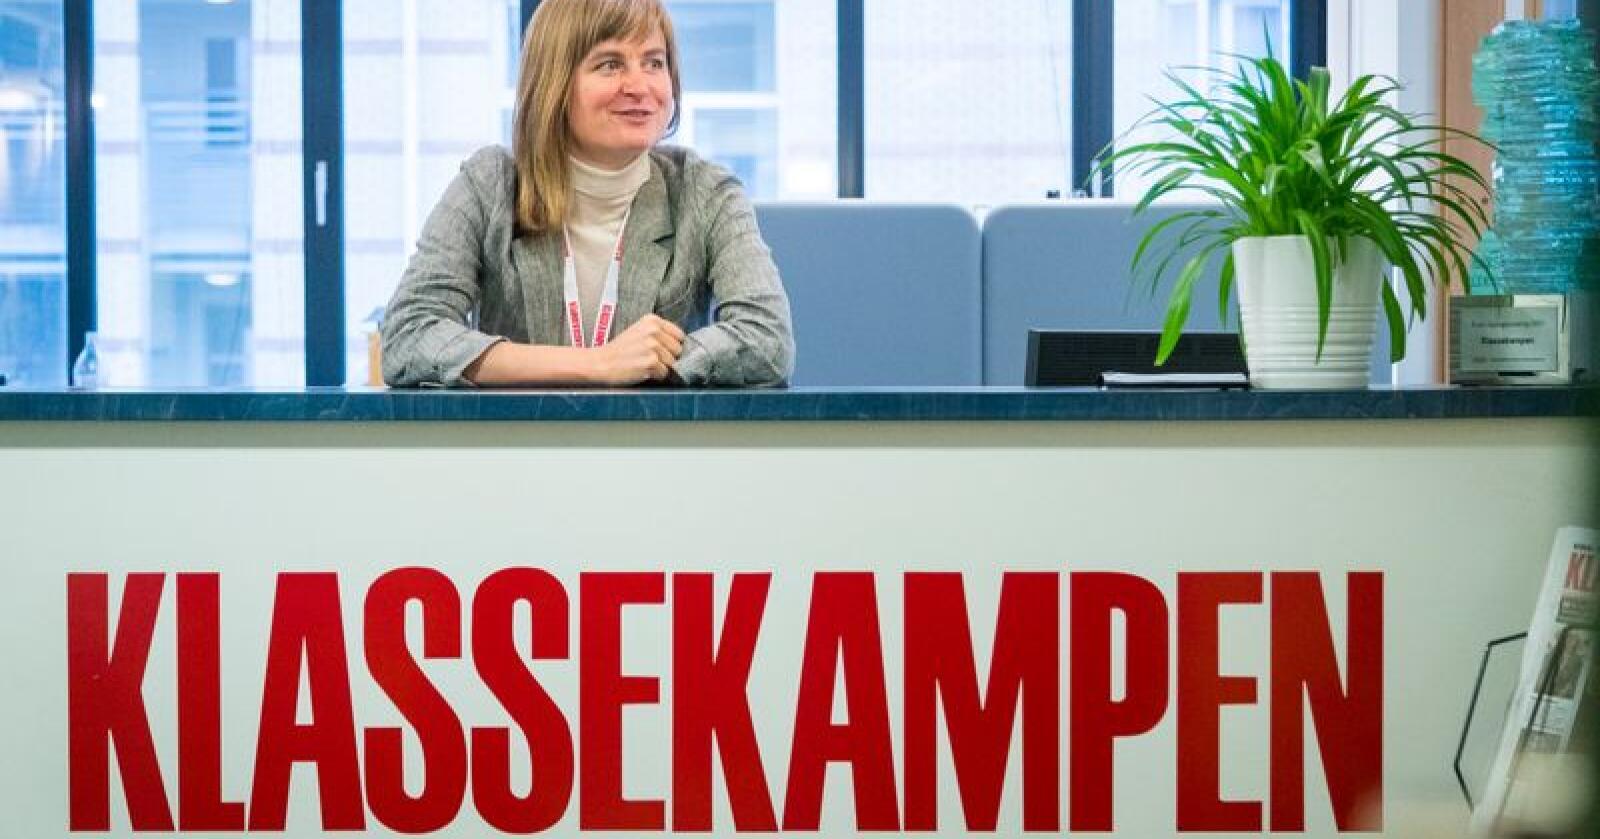 Mer distrikt: Klassekampen og redaktør Mari Skurdal målbærer desentrale verdier. Foto: Heiko Junge / NTB scanpix